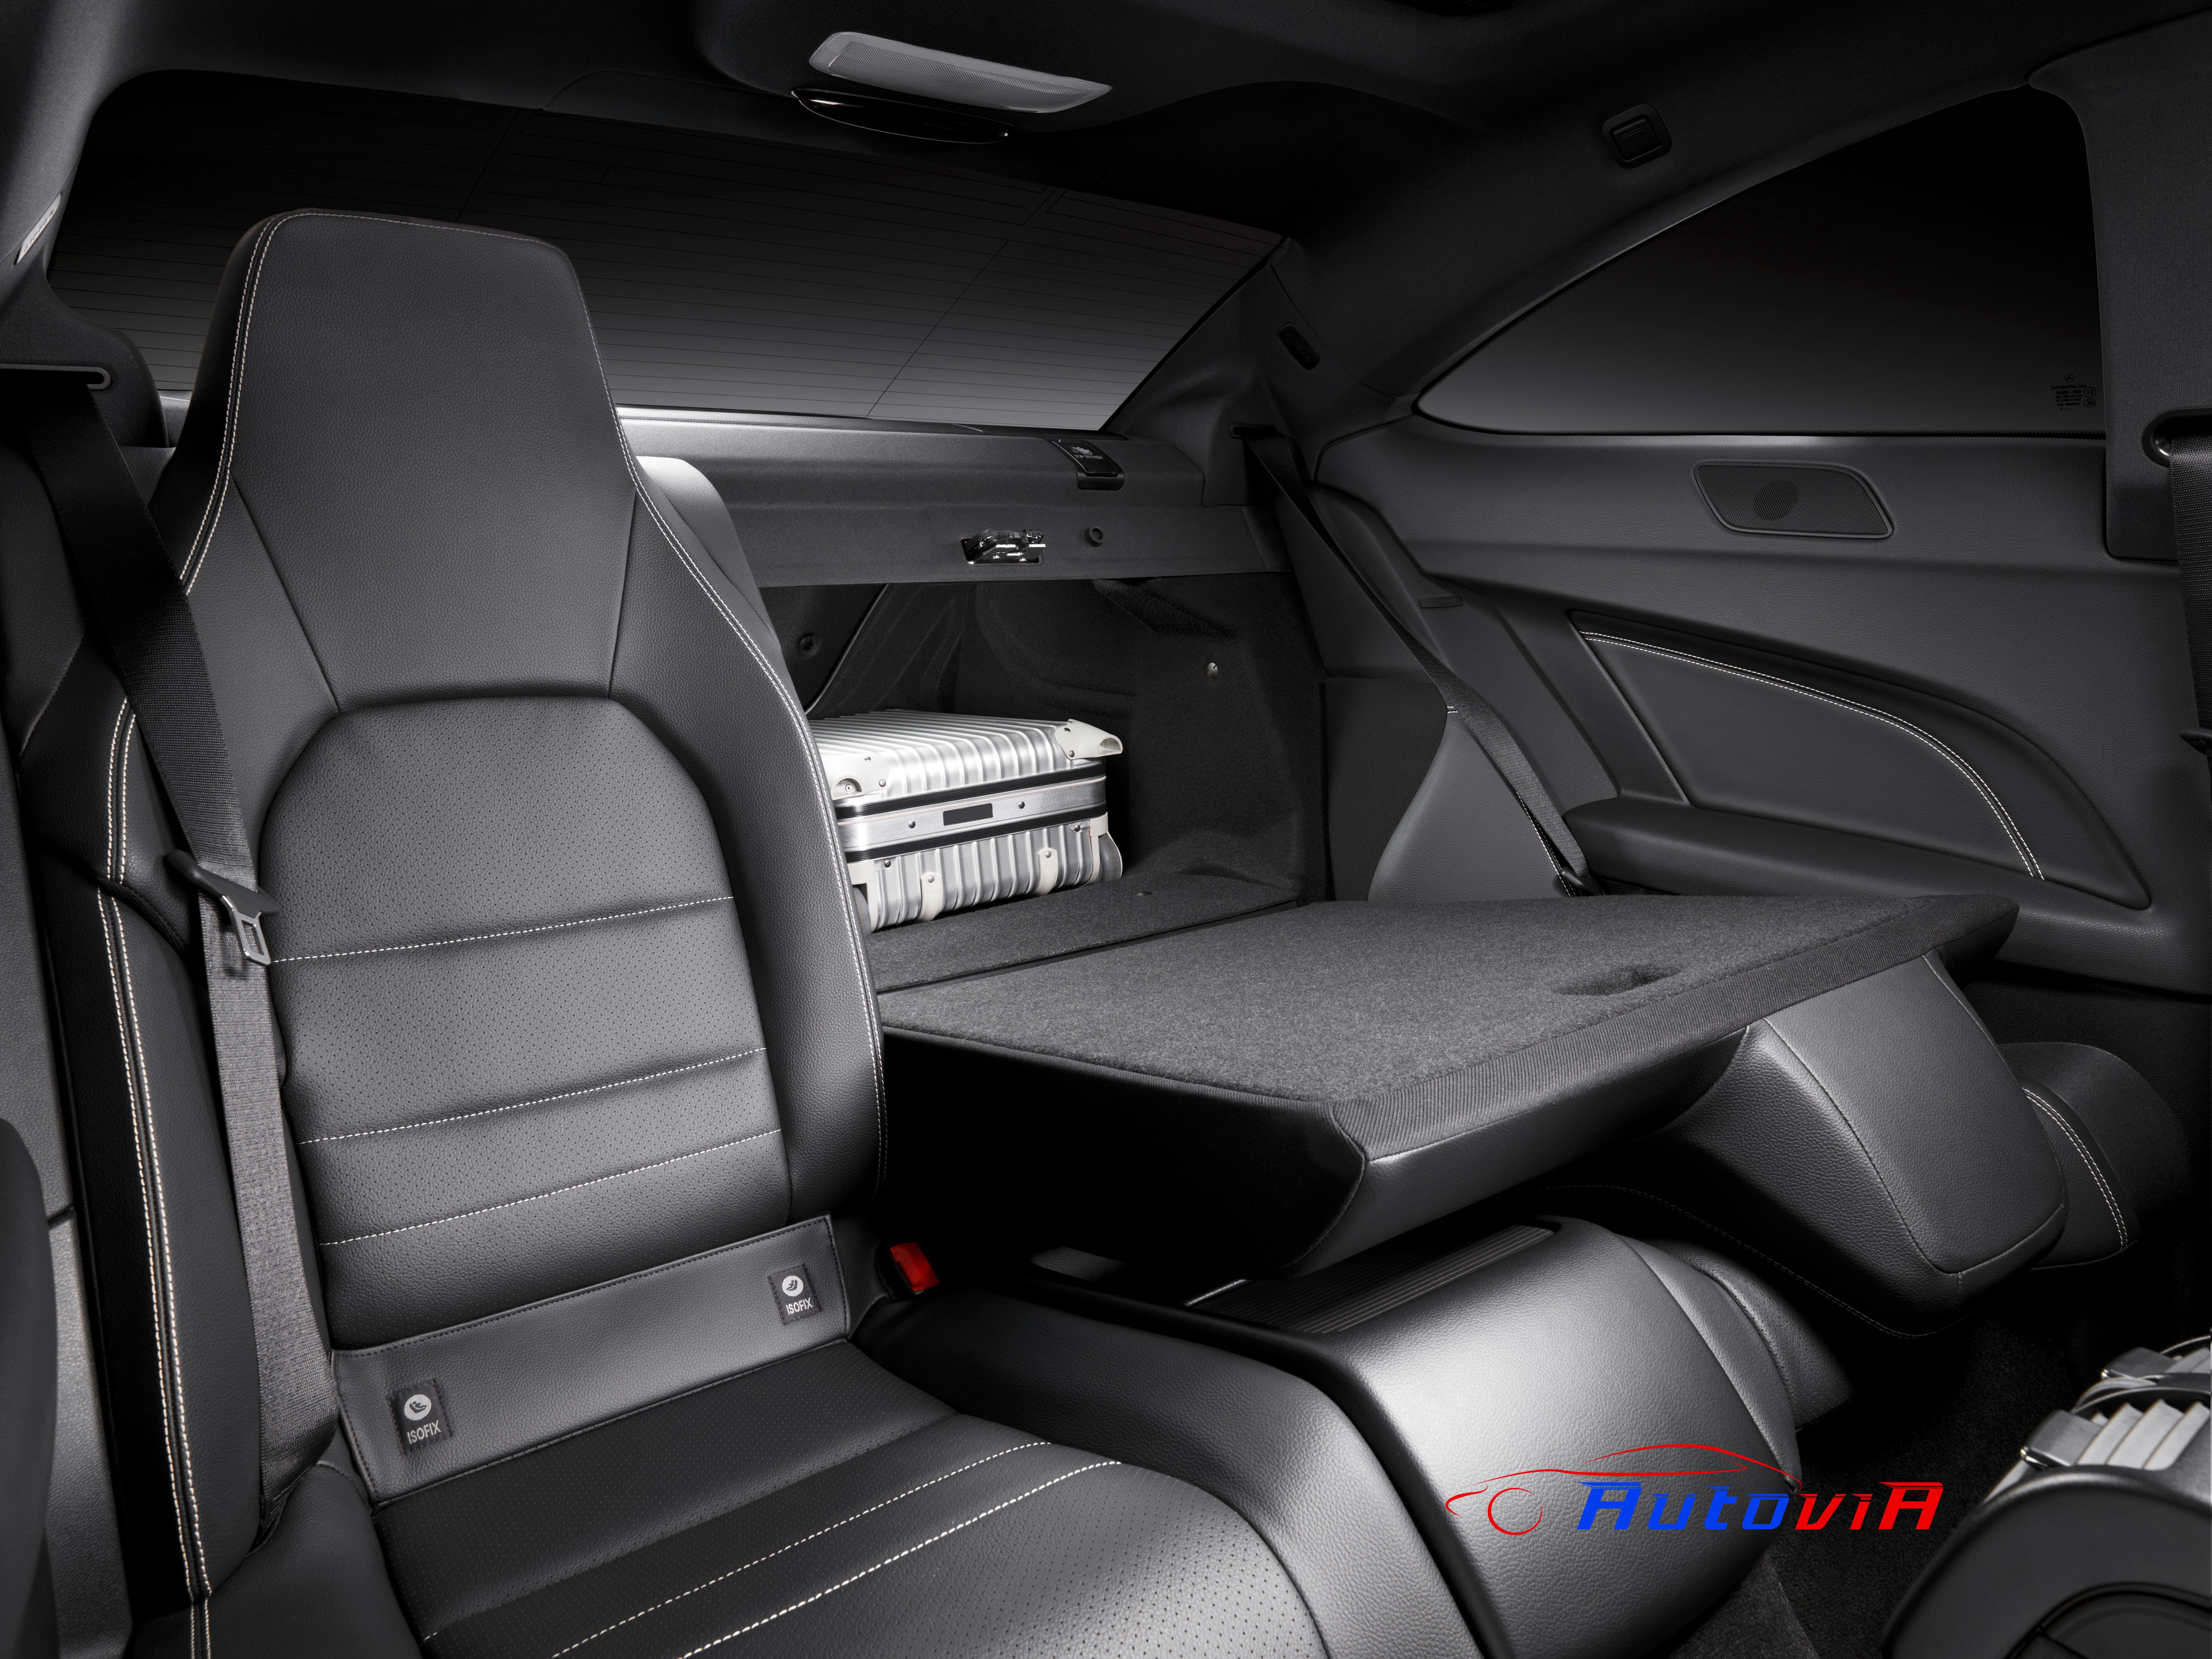 Mercedes benz clase c coup interior 03 for Interior mercedes clase c